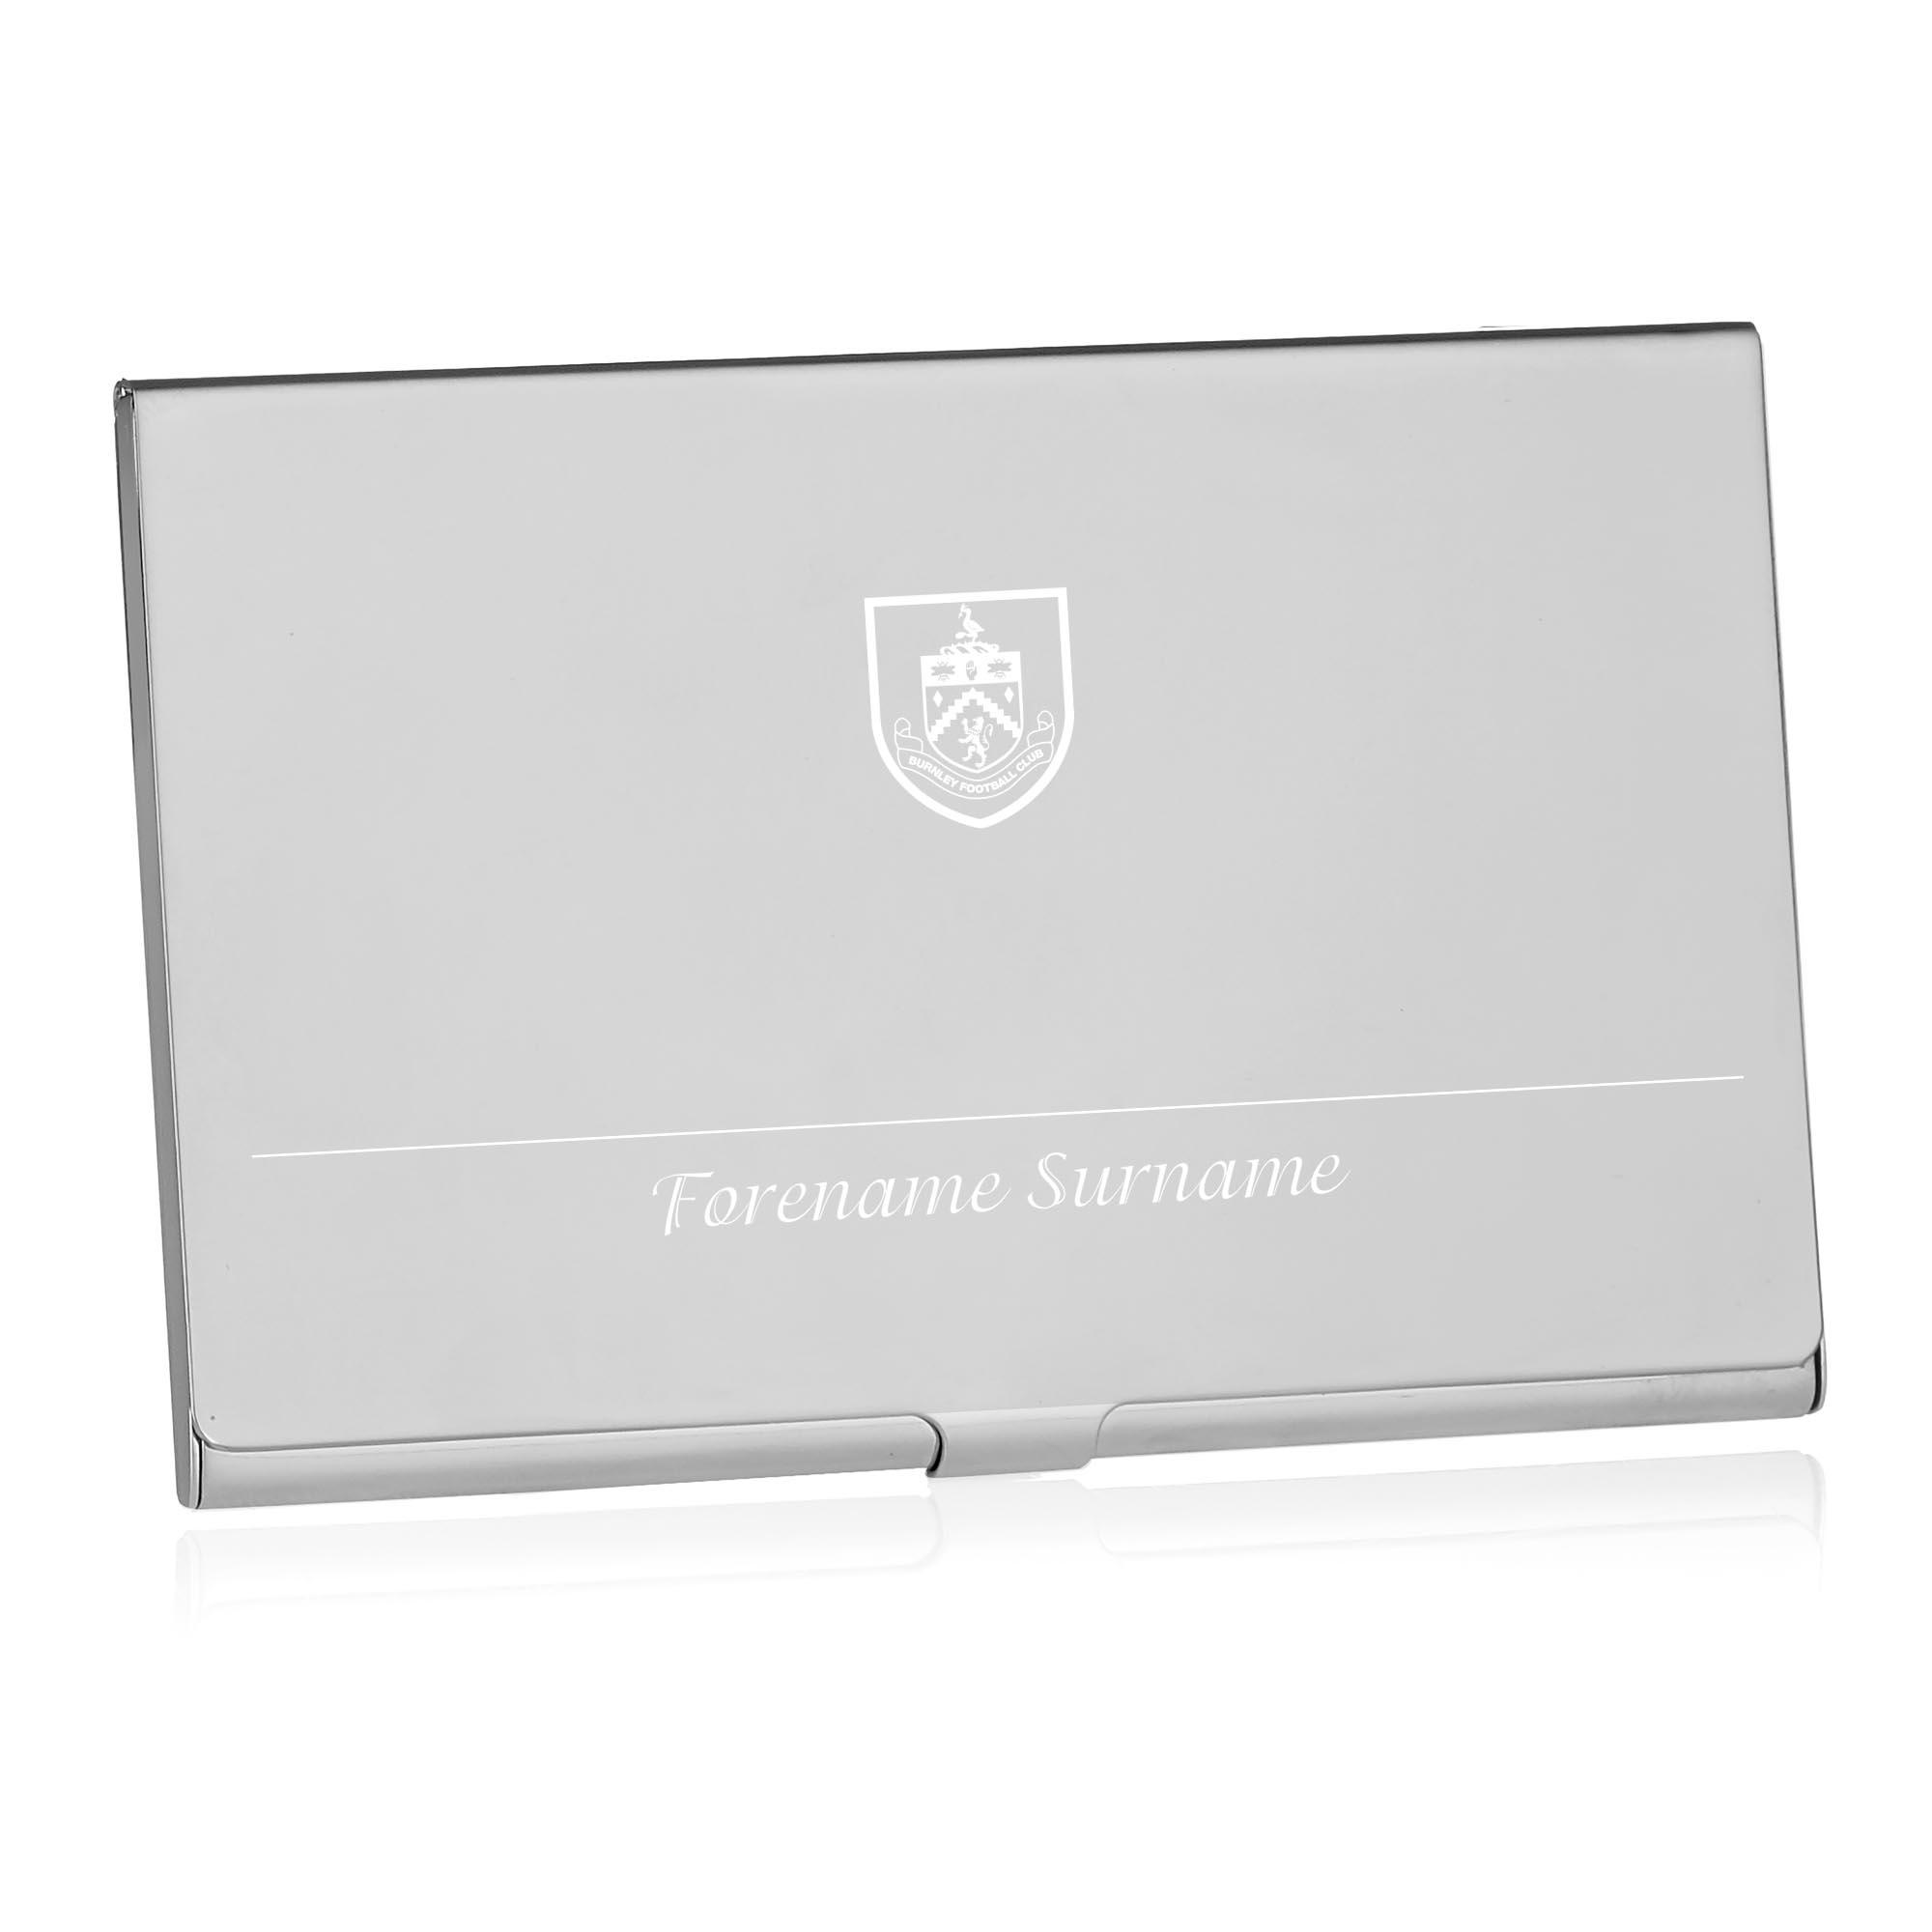 Burnley FC Executive Business Card Holder